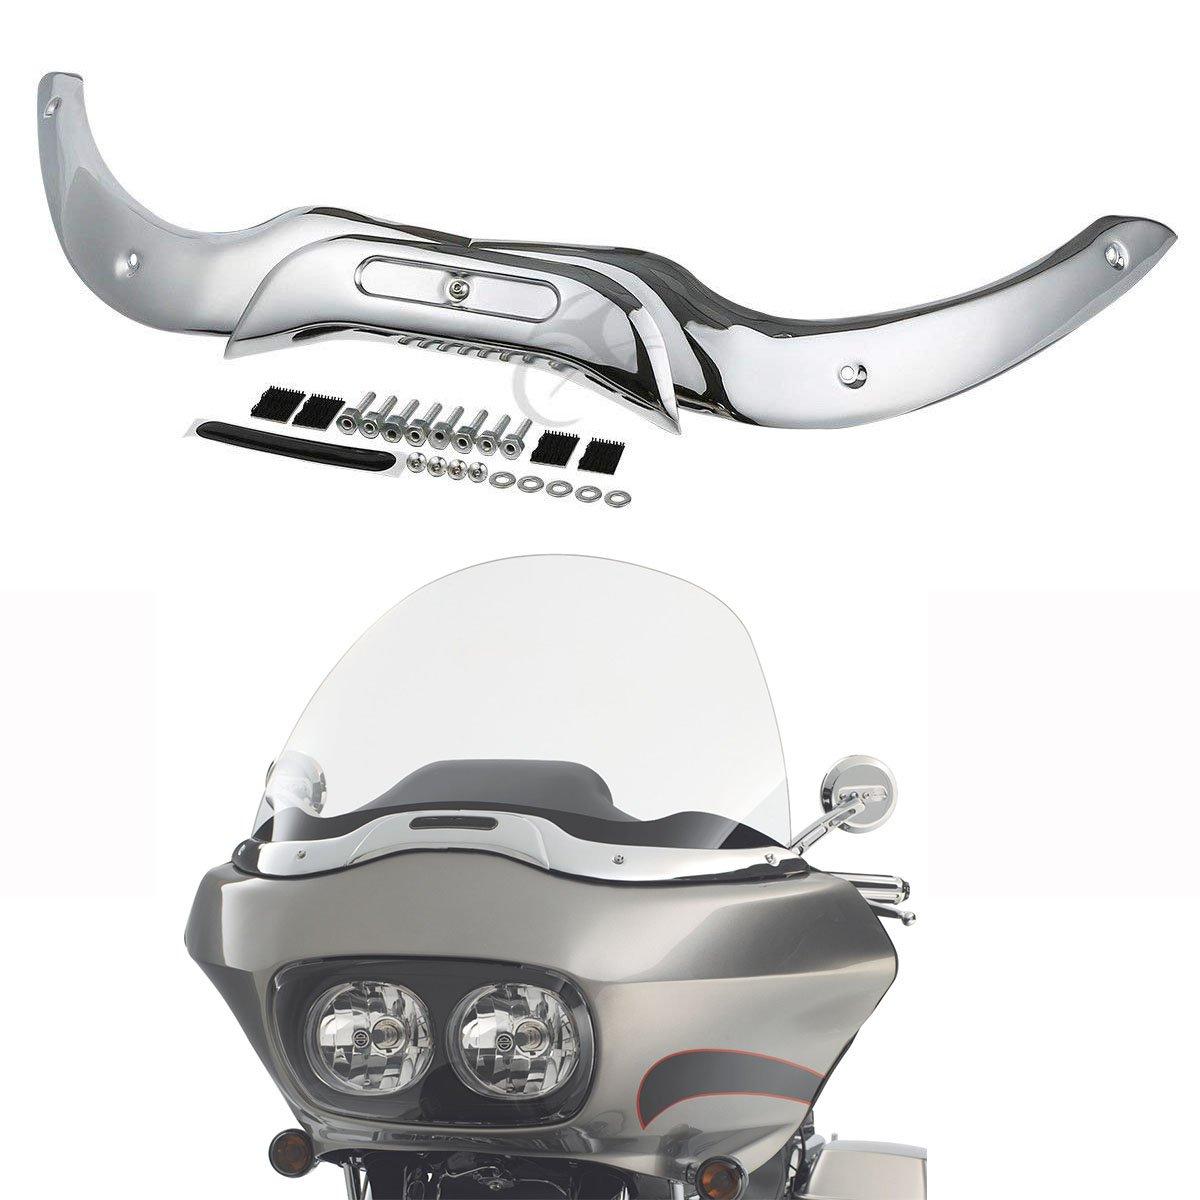 XFMT Windshield Windscreen Trim Set Chrome For Harley Touring Road Glide 2004-2013 05